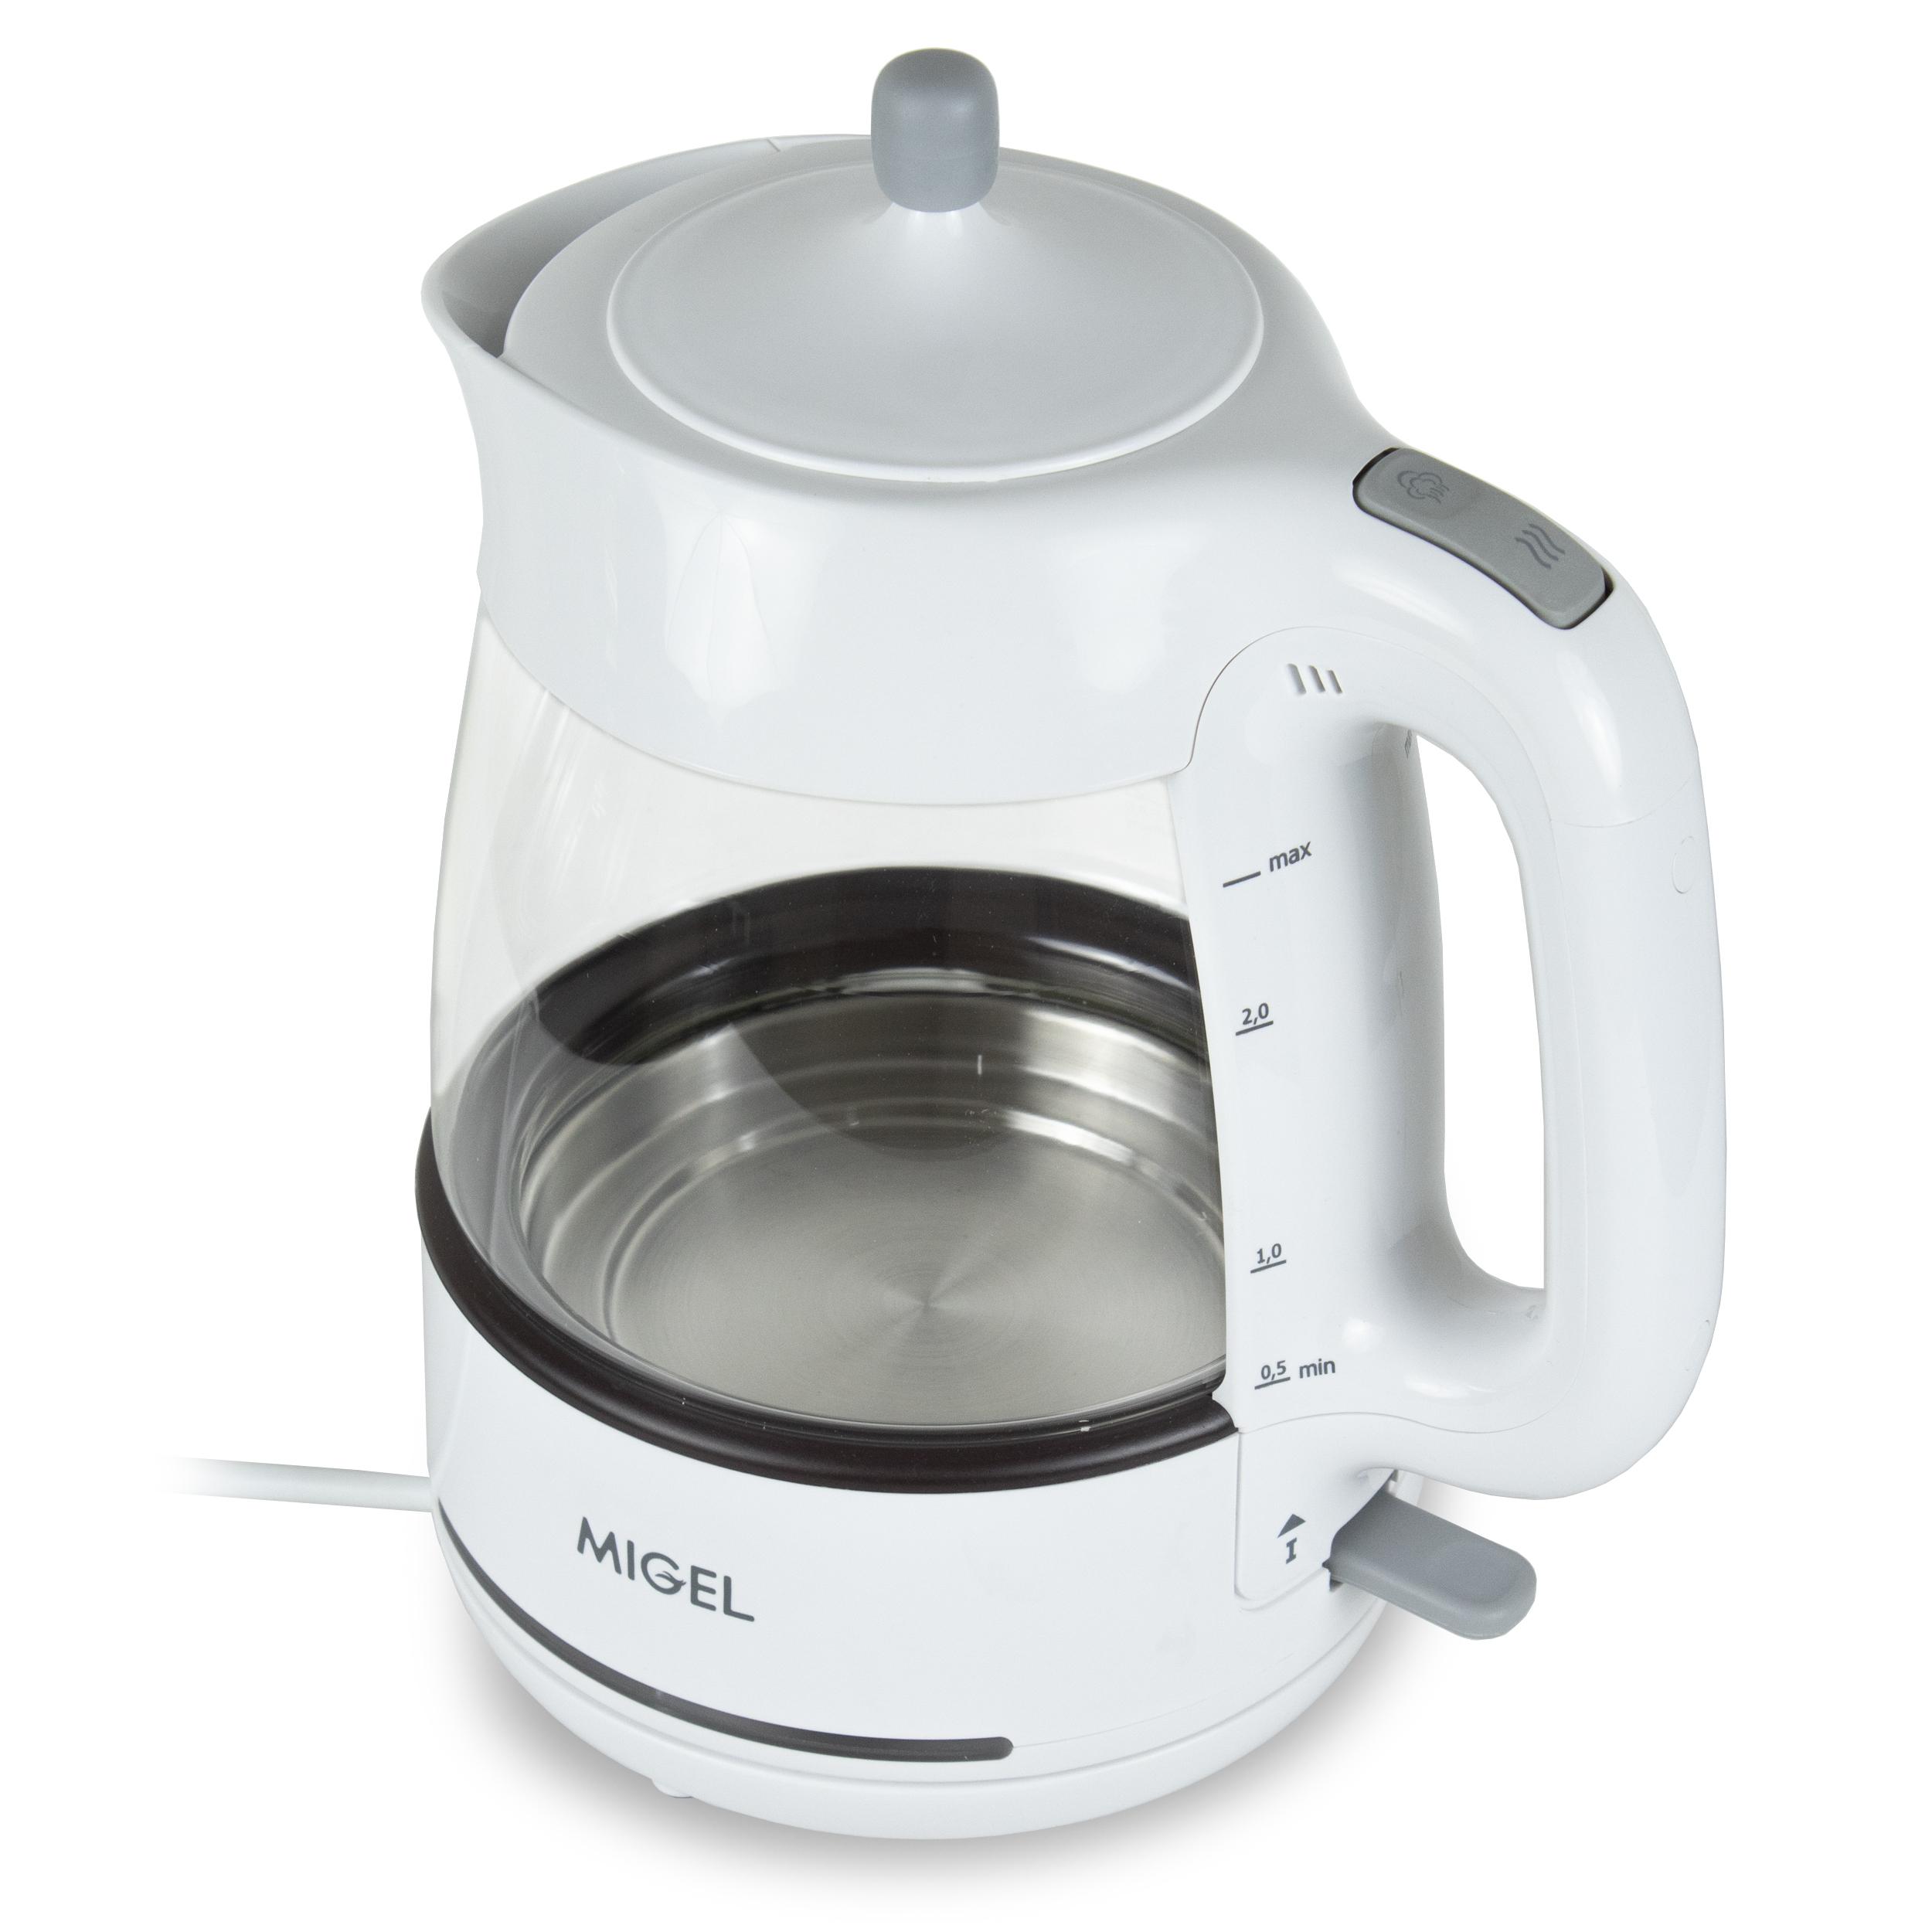 چای ساز میگل مدل GTS 070 main 1 7